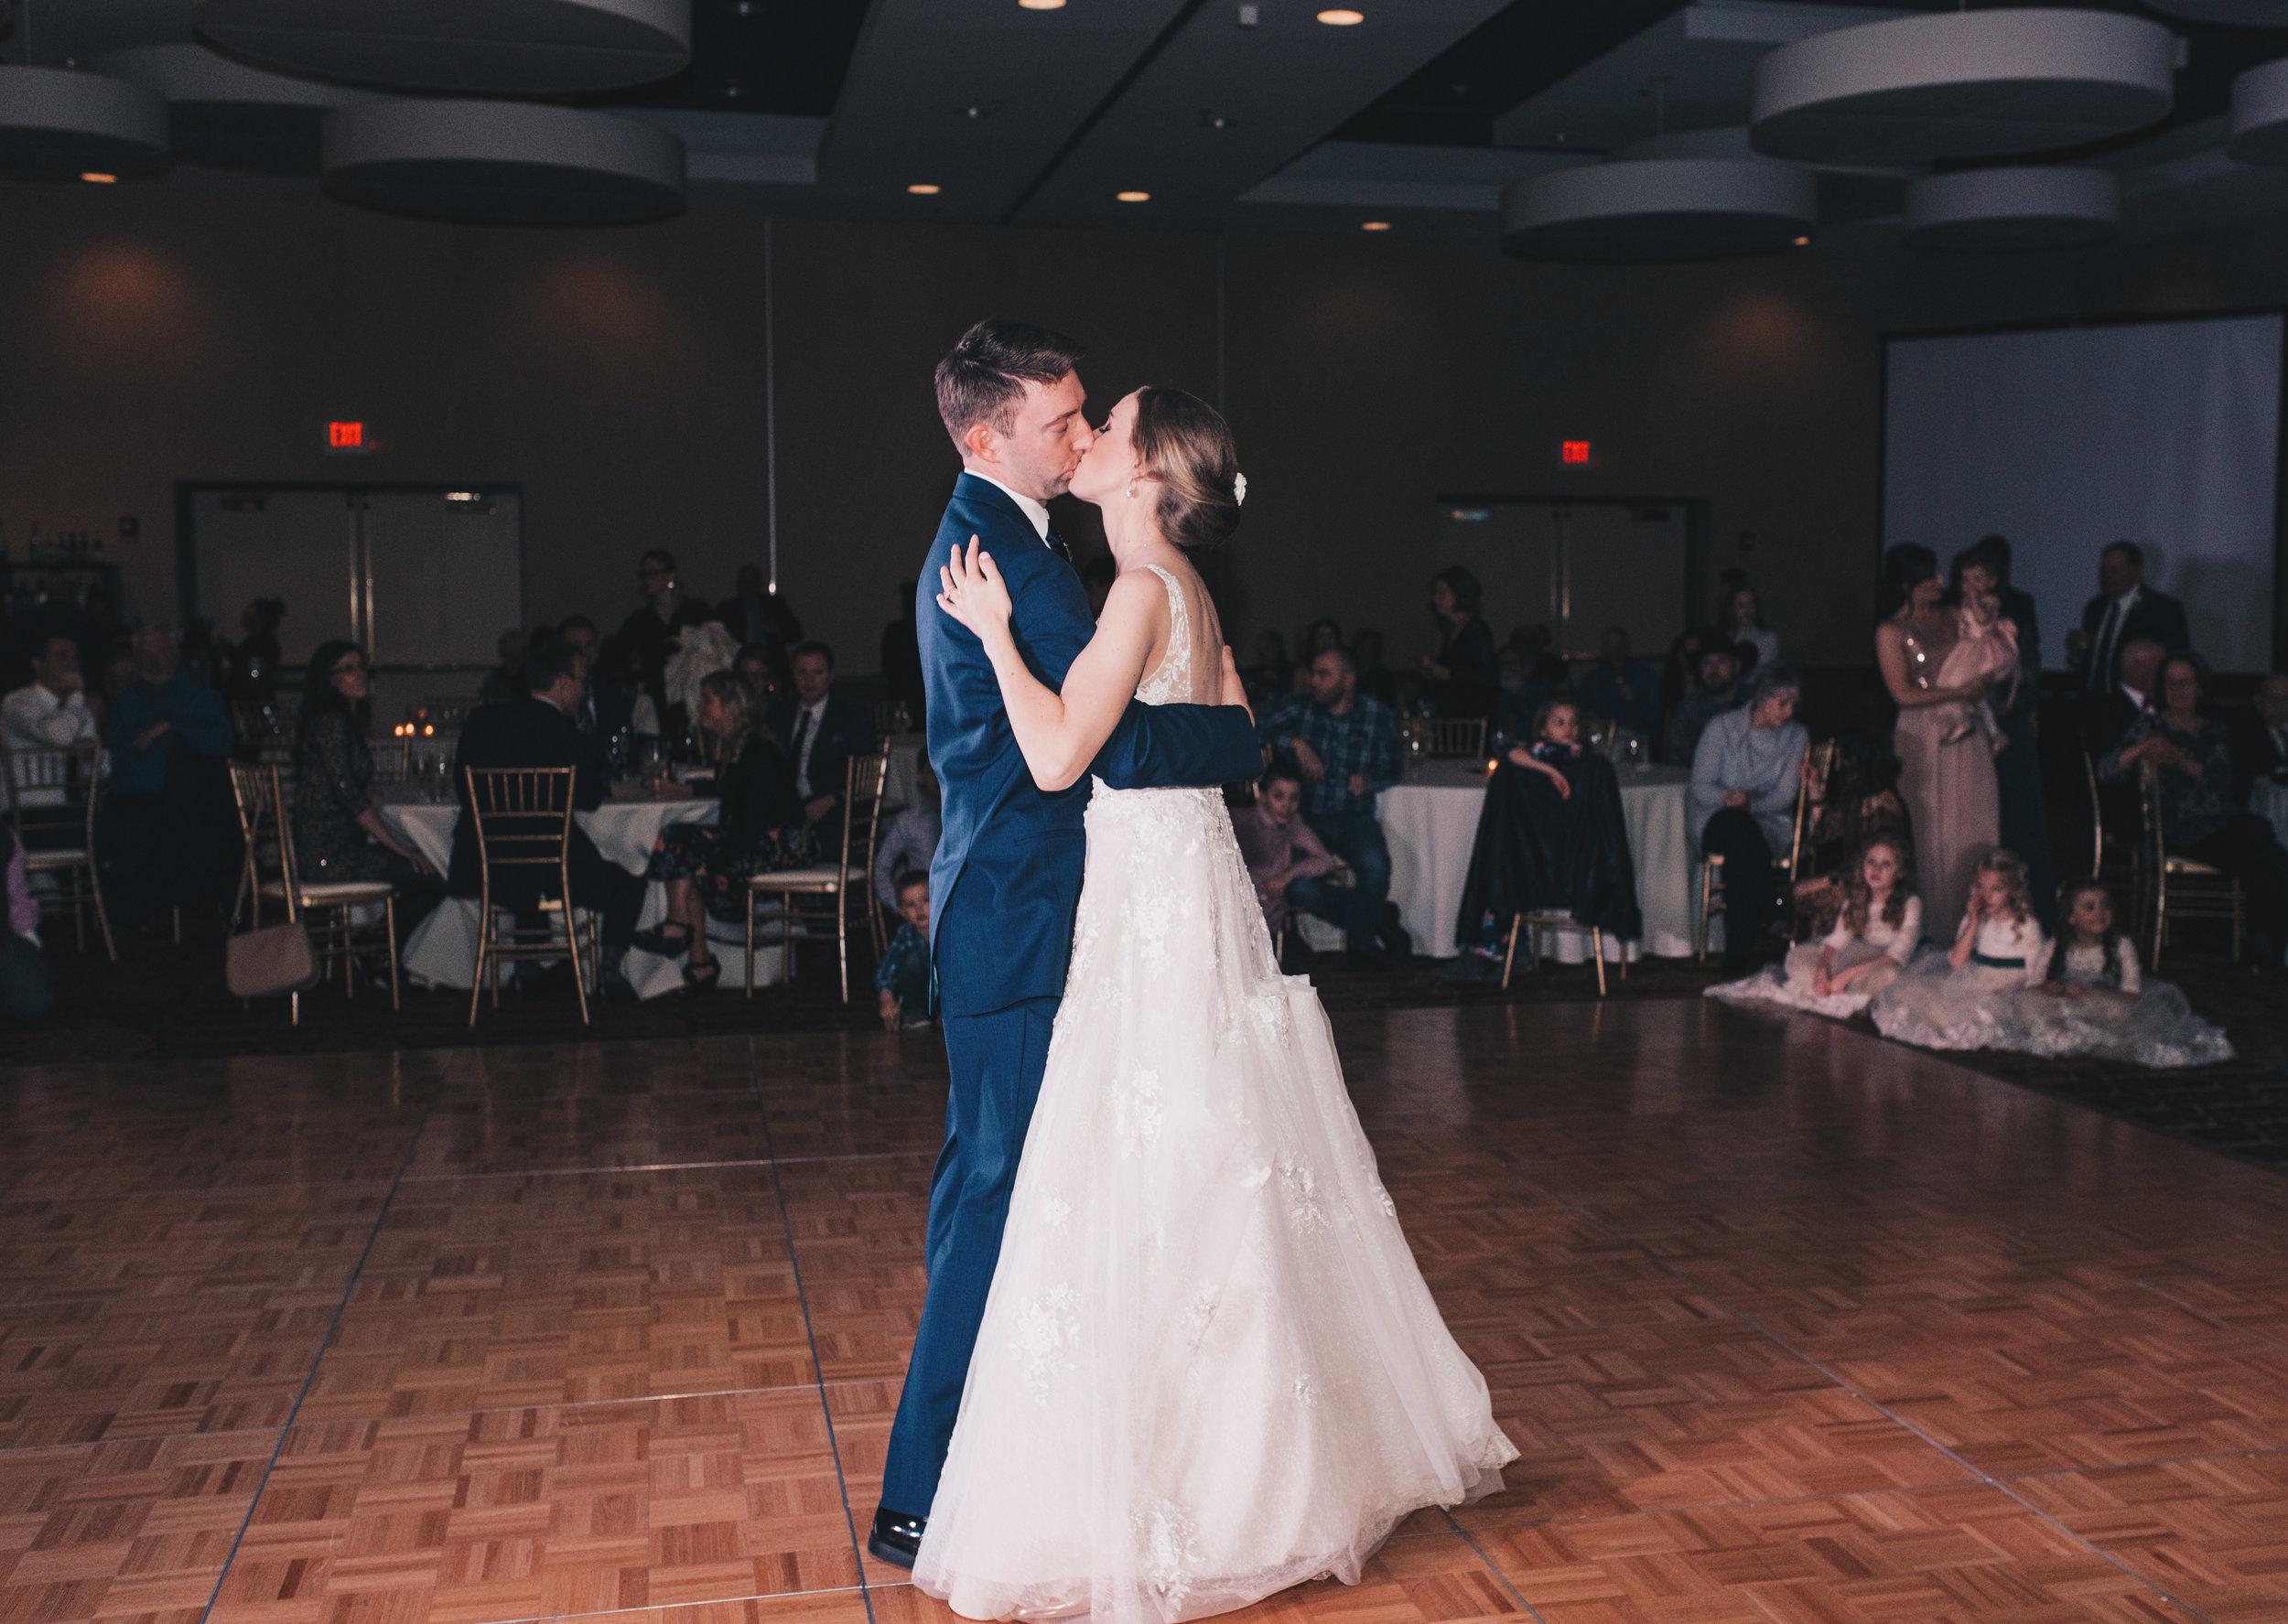 Winter Wedding, Chicago Winter Wedding, Chicago Wedding Photographer, Illinois Wedding, Illinois Wedding Photographer, Classy Modern Wedding, Reception Photos, First Dance Photos